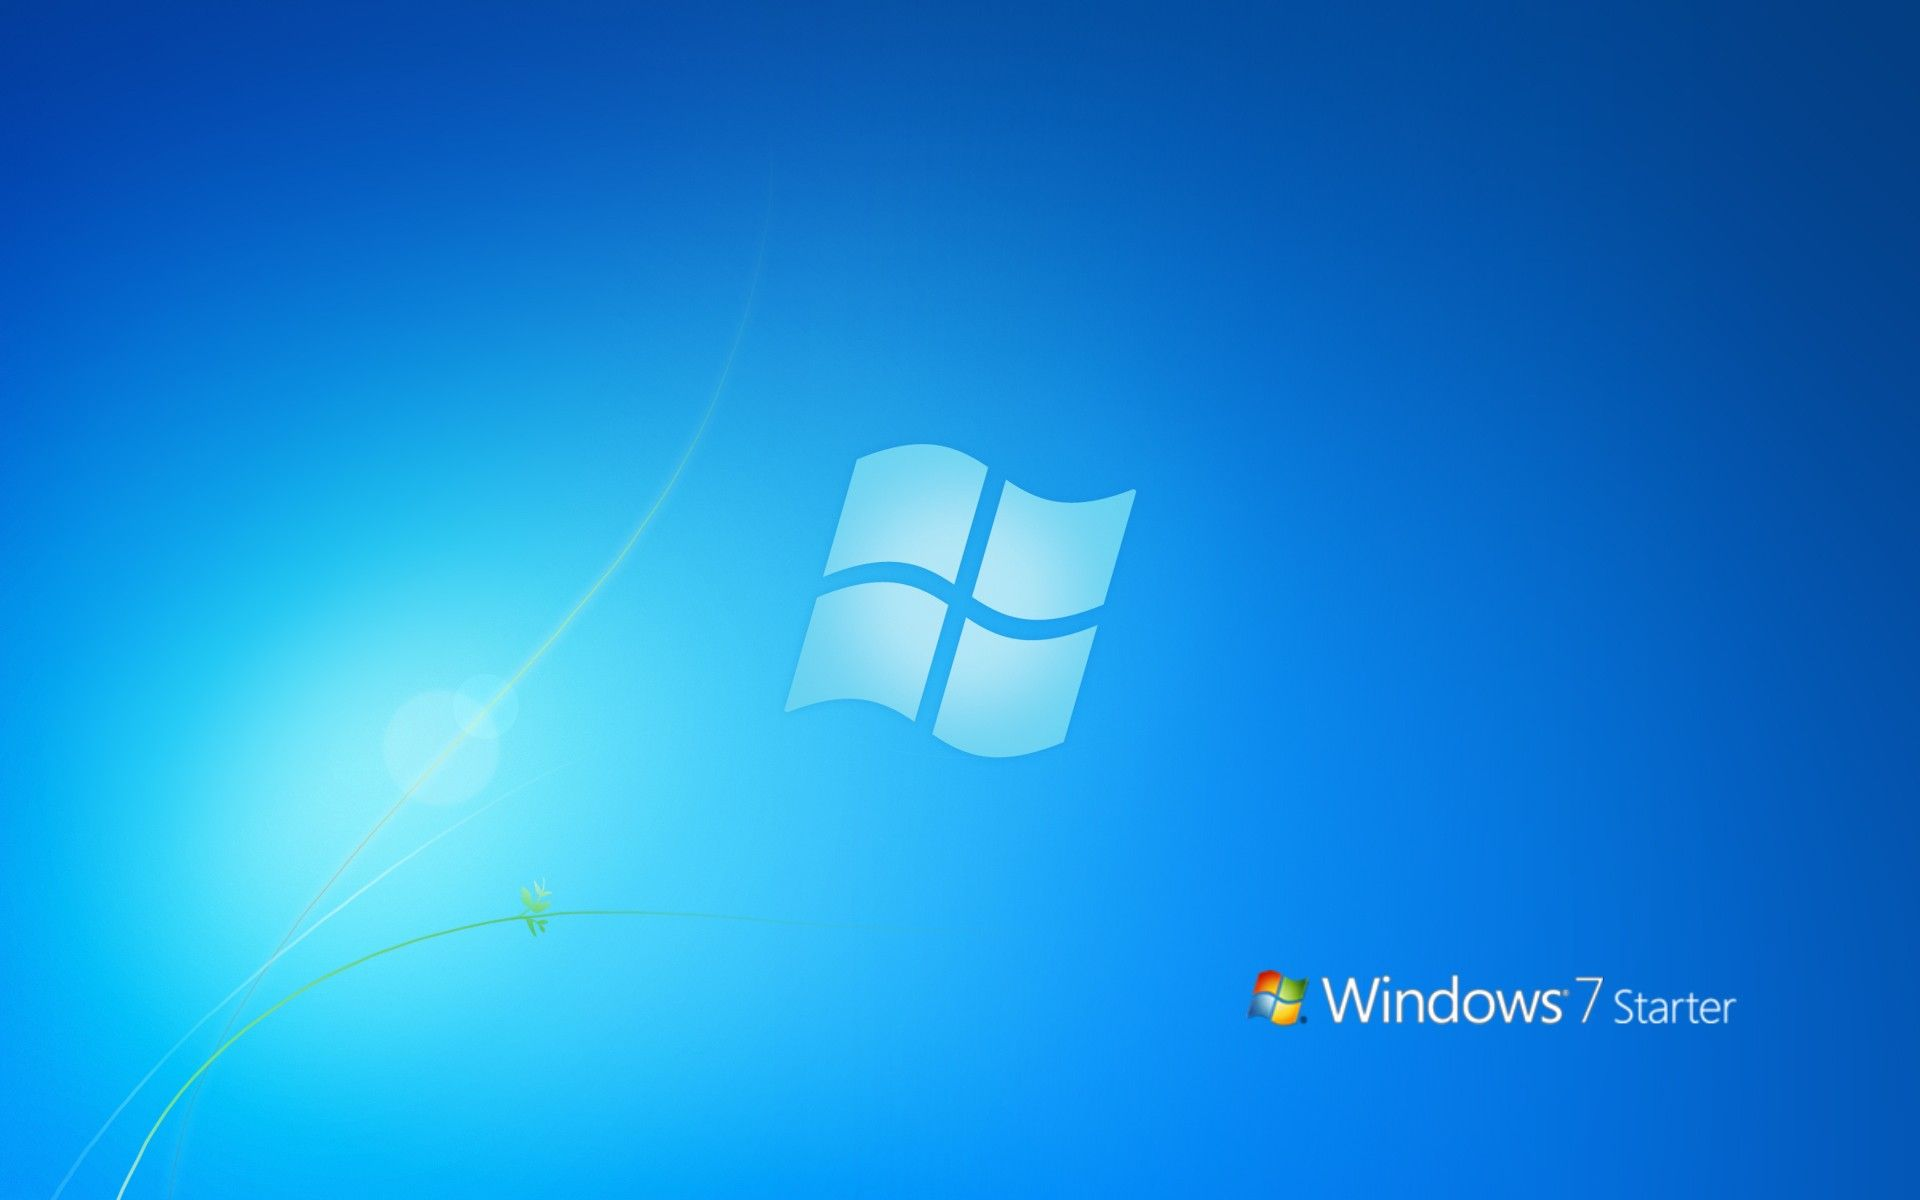 Windows 7 starter set wallpaper